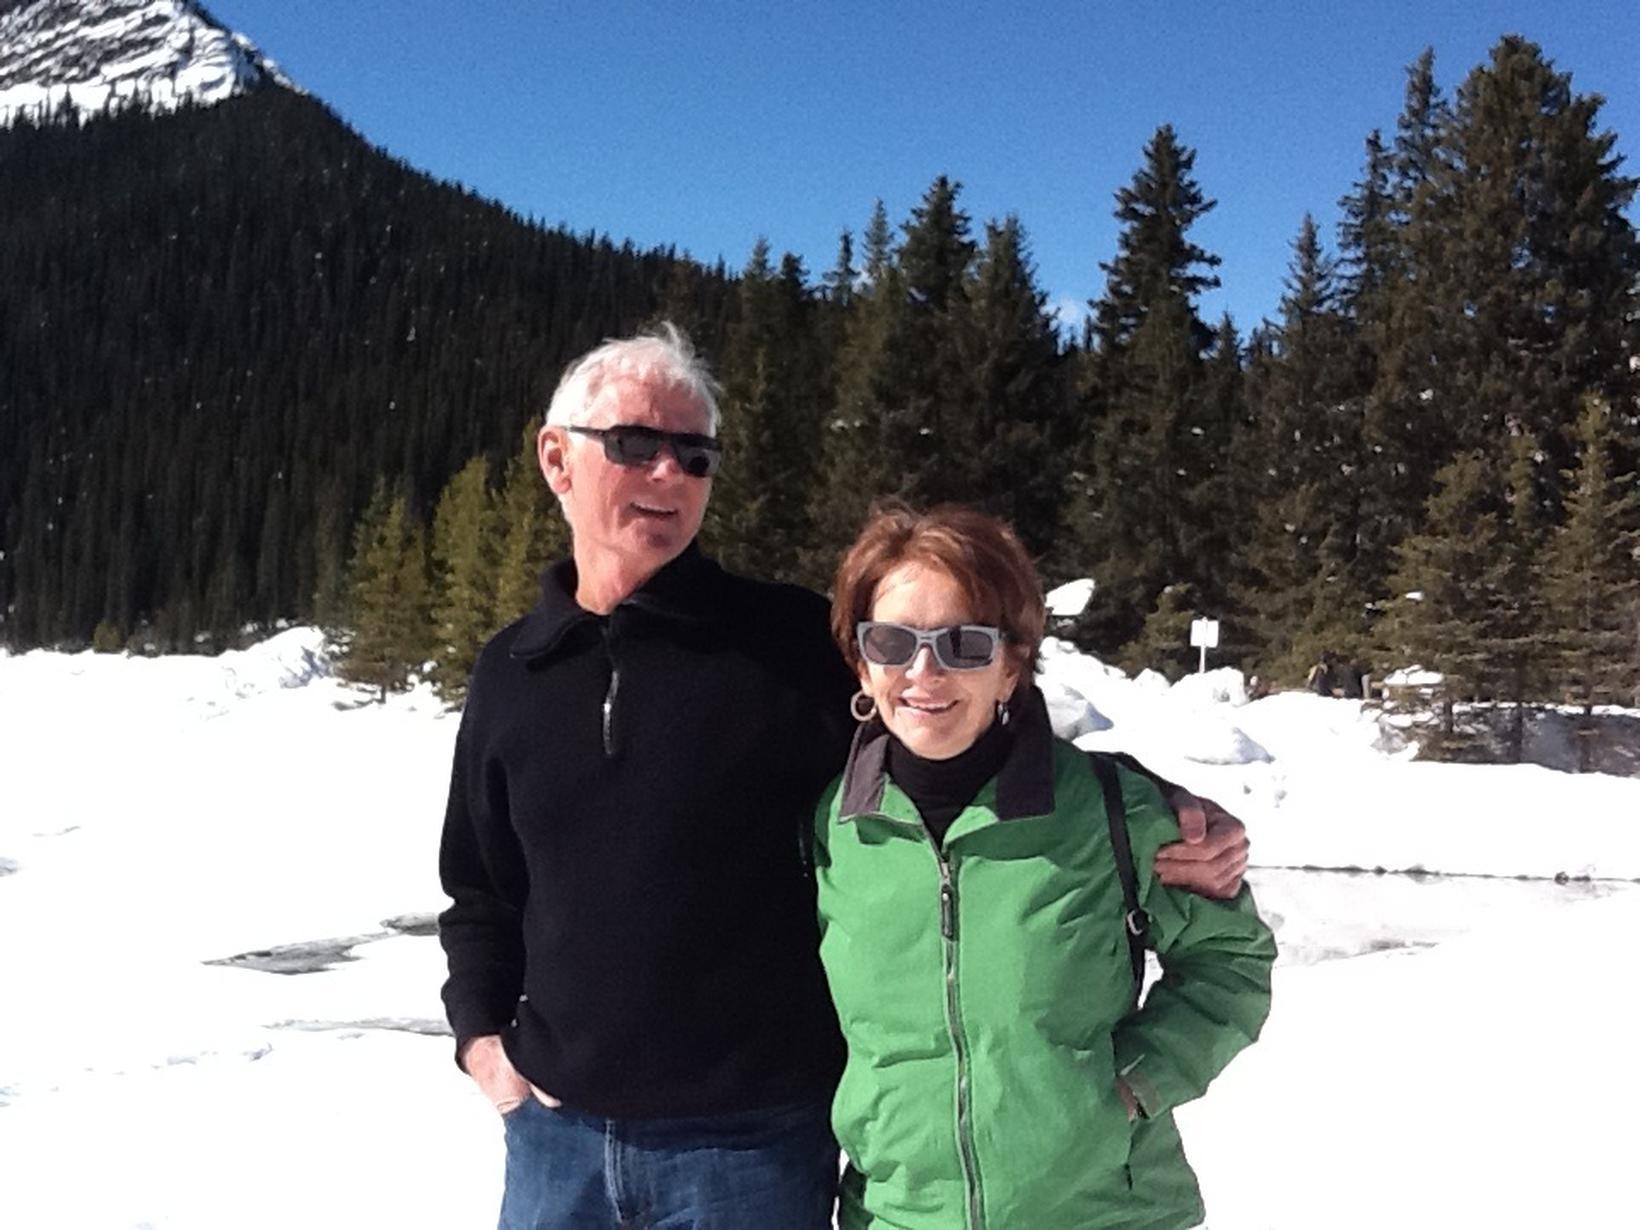 Janice & Les from Halifax, Nova Scotia, Canada